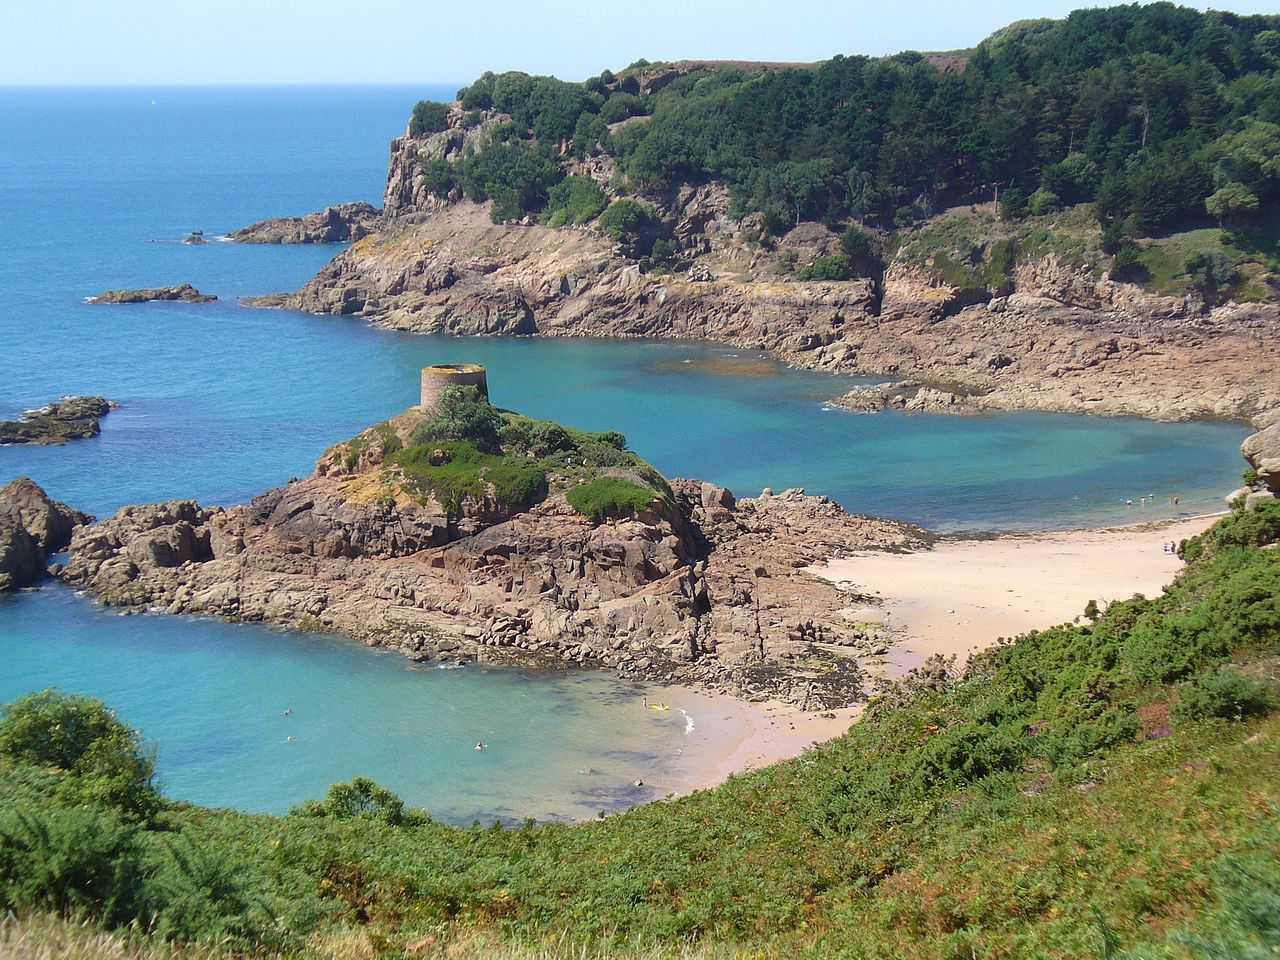 L'Île au Guerdain in Saint Brelade, Jersey